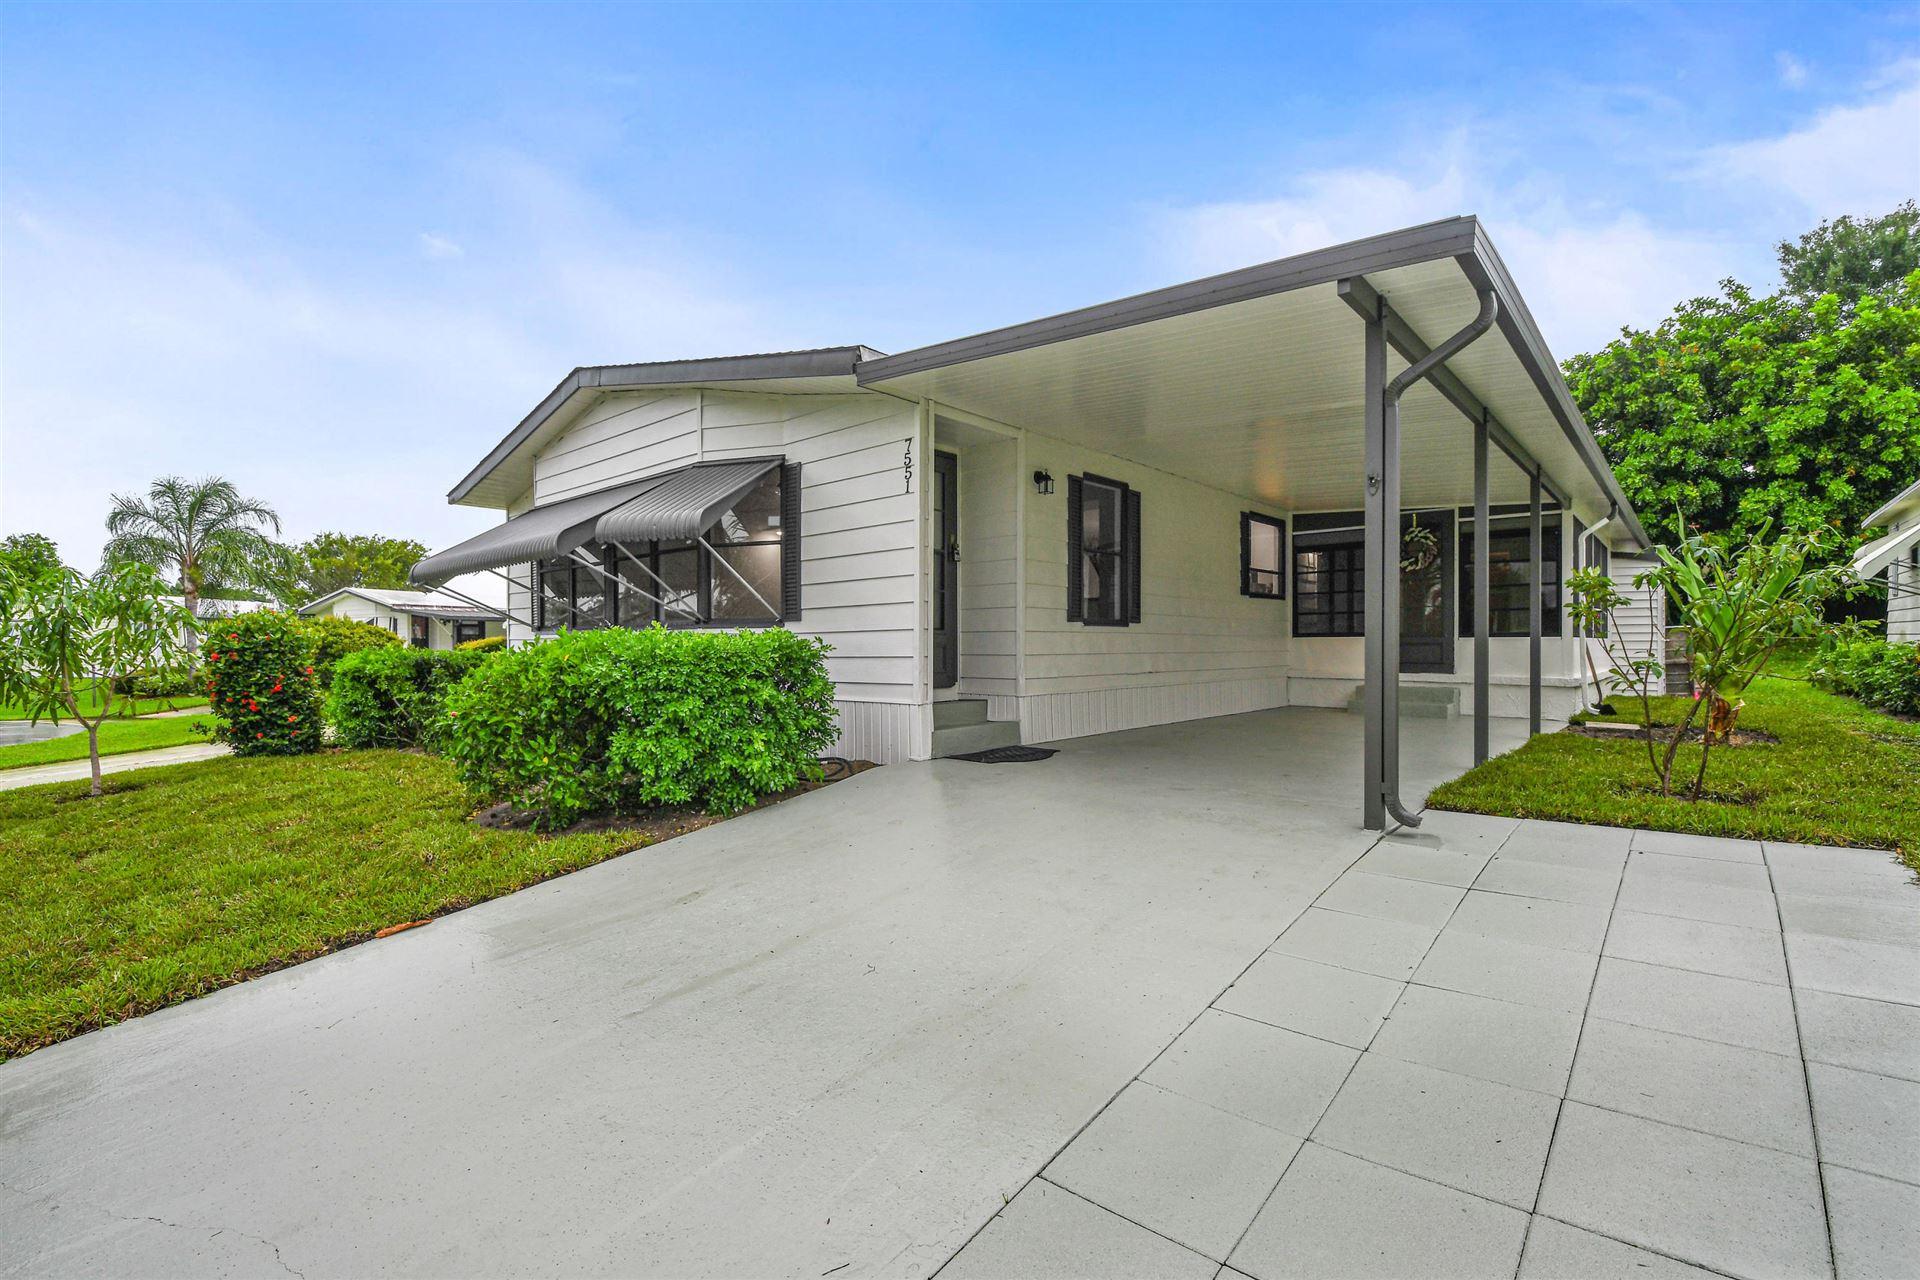 7551 SE Shenandoah Drive, Hobe Sound, FL 33455 - MLS#: RX-10730879